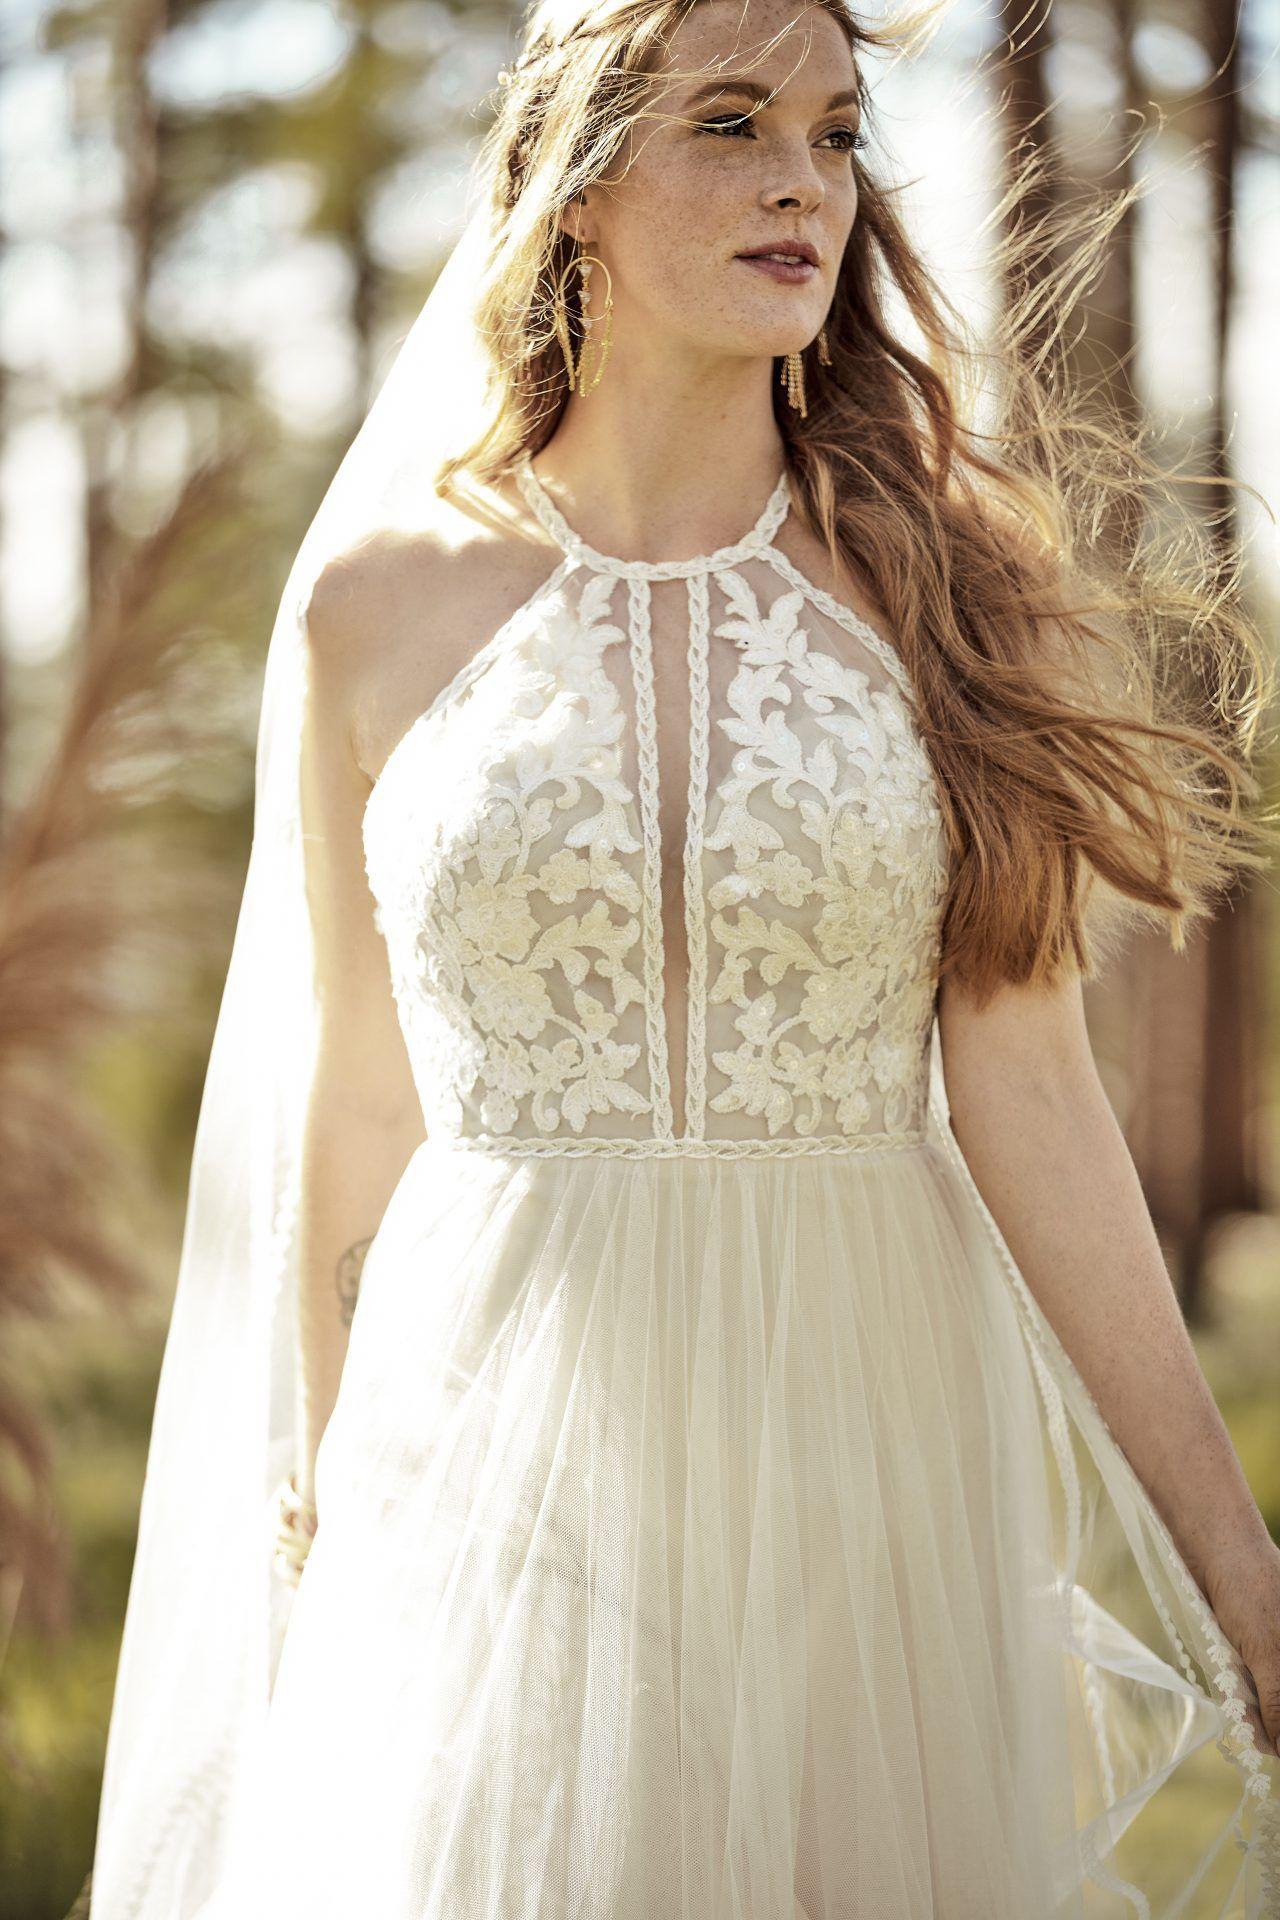 All Who Wander Boho Wedding Dress Lace Wedding Dresses Boho Wedding Dress [ 1920 x 1280 Pixel ]